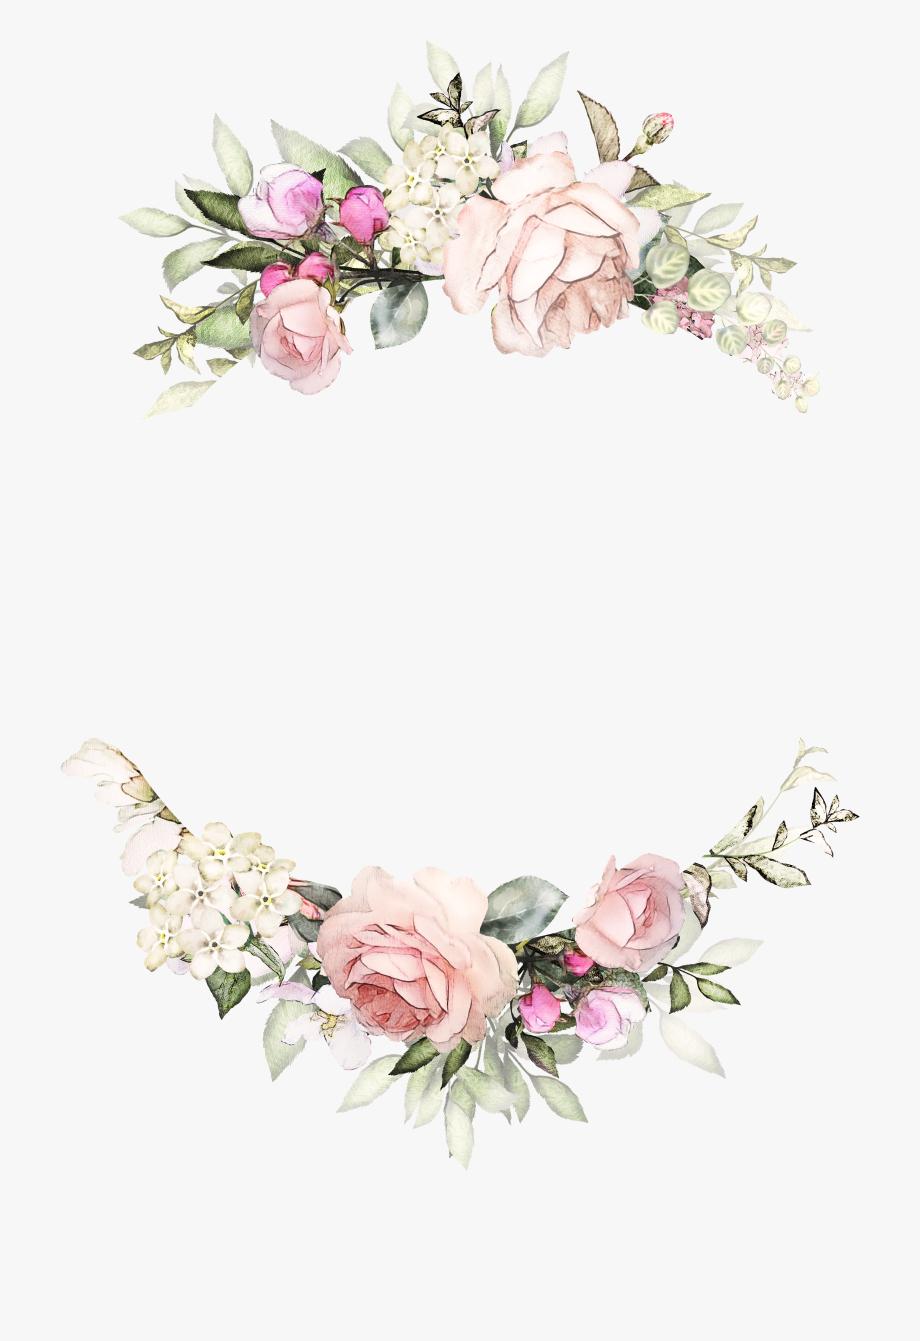 Free wedding banner clipart floral vintage rose jpg free Vintage Rose Wreath Invitations Paper Design Invitation - Floral ... jpg free